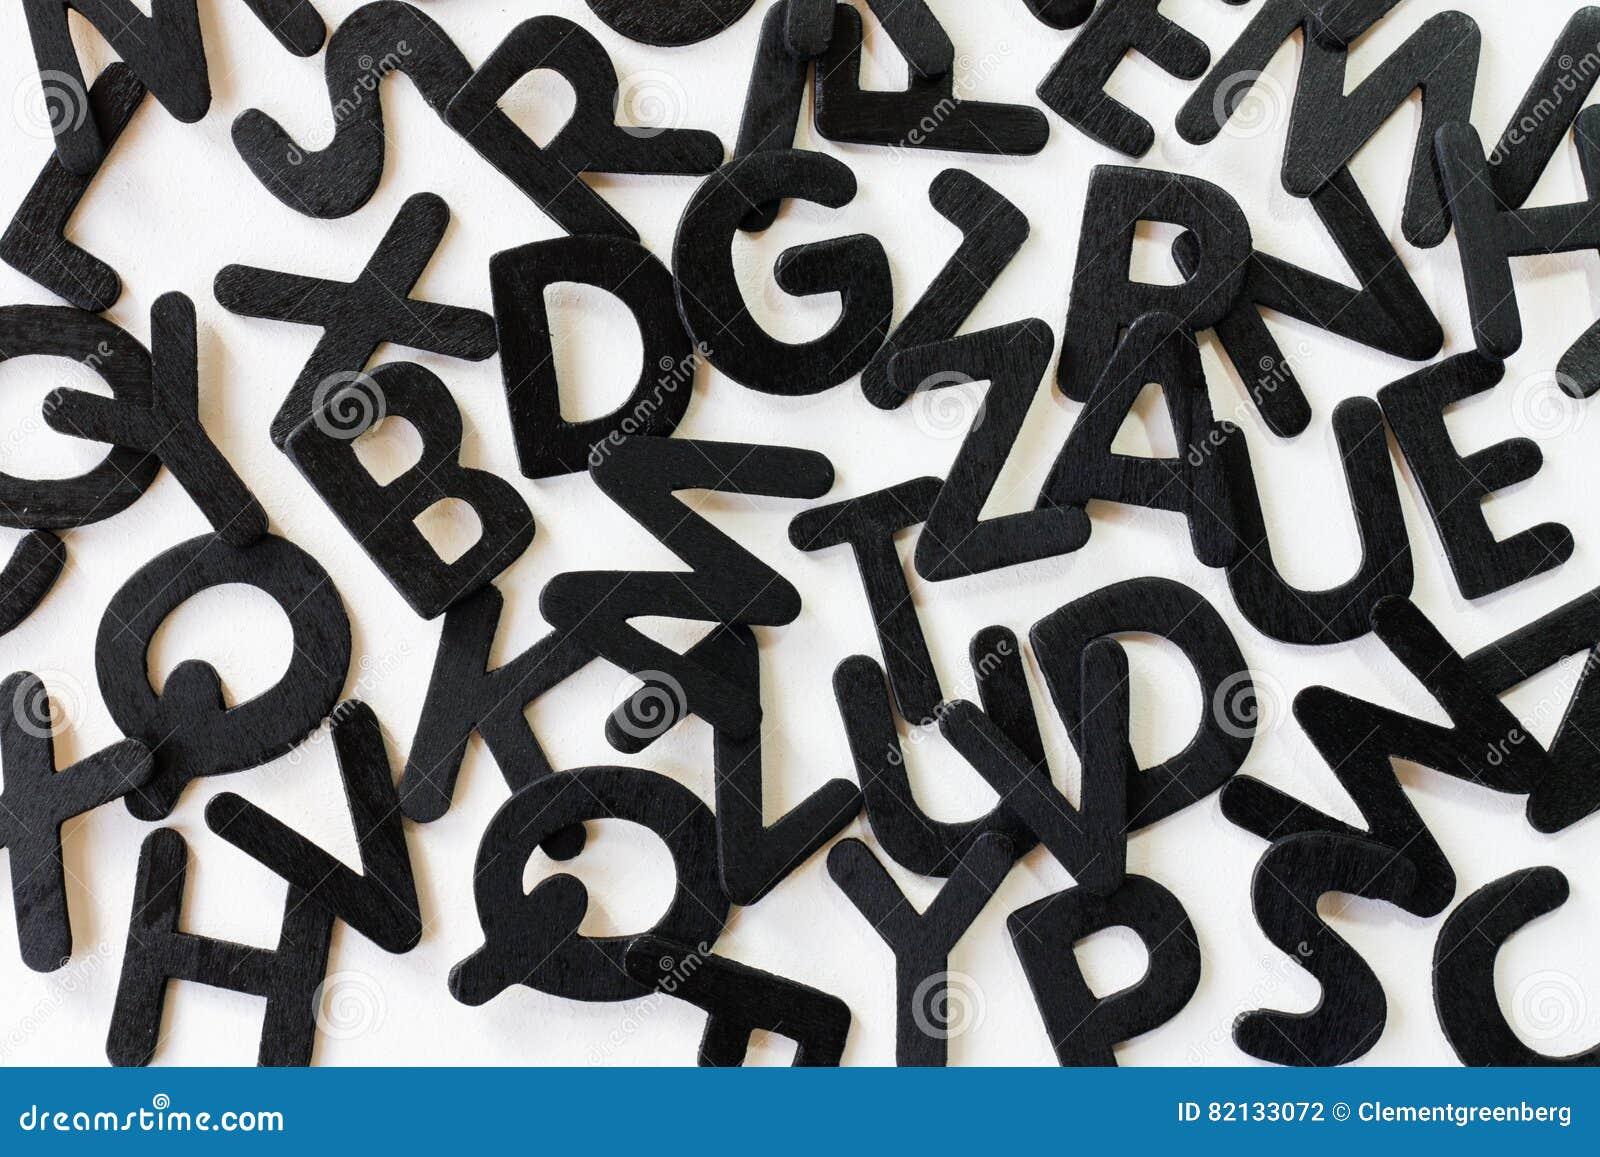 Random Alphabet Letters On A White Background Stock Photo Image Of